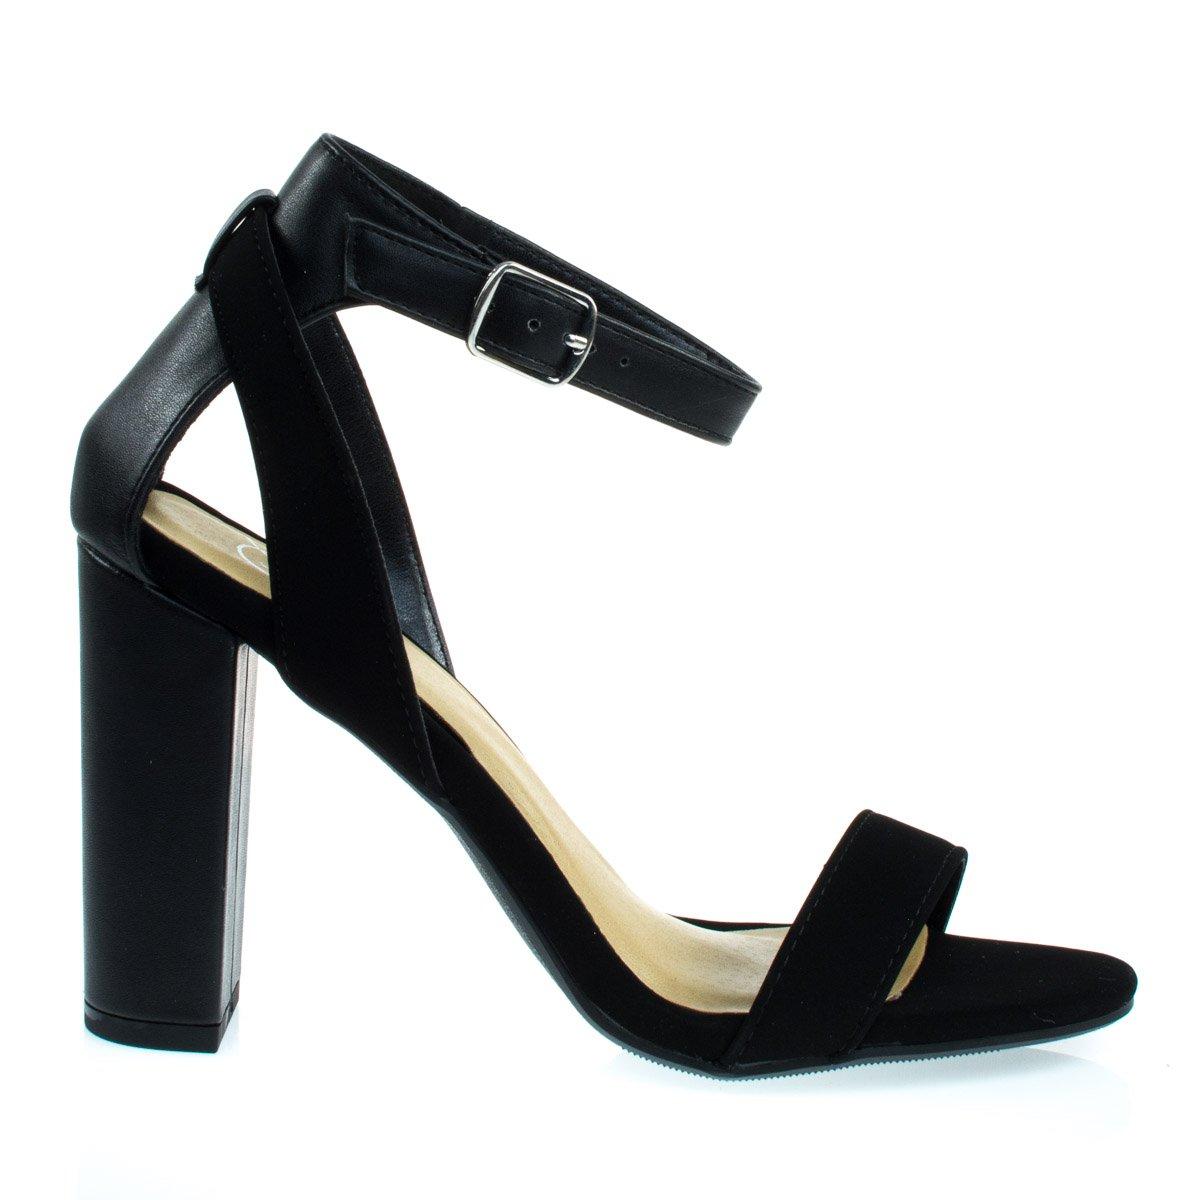 Delicious Econ Black Nubuck Chunky Block Heel Dress Sandal w Faux Leather/Nubuck Combo Straps -7